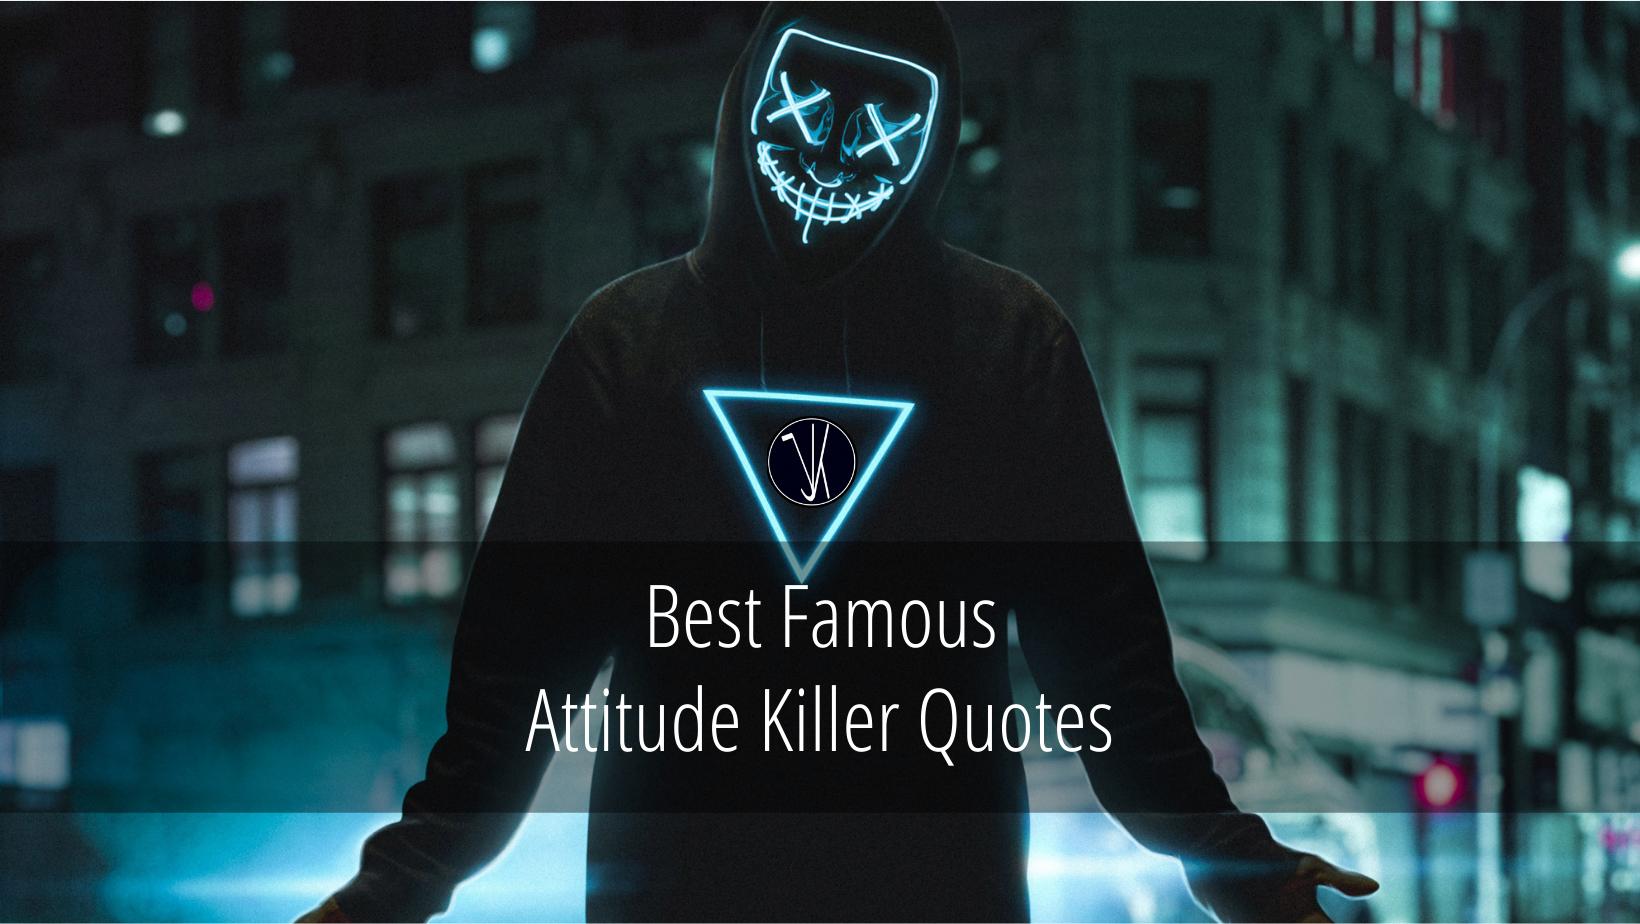 Attitude Killer Quotes